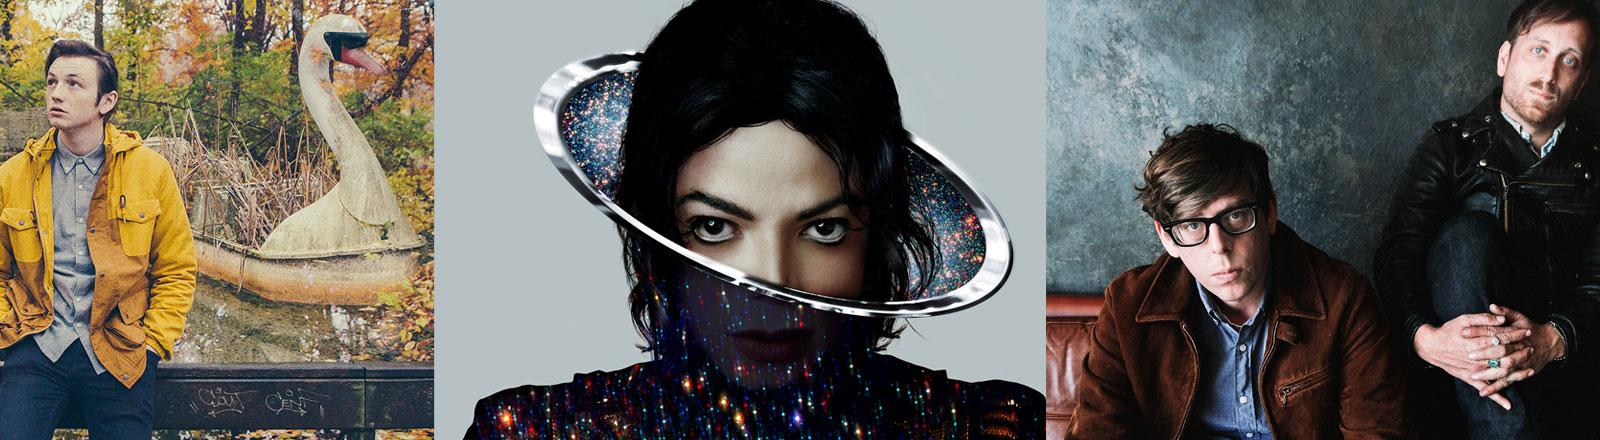 Lewis Watson, Michael Jackson und die Black Keys.